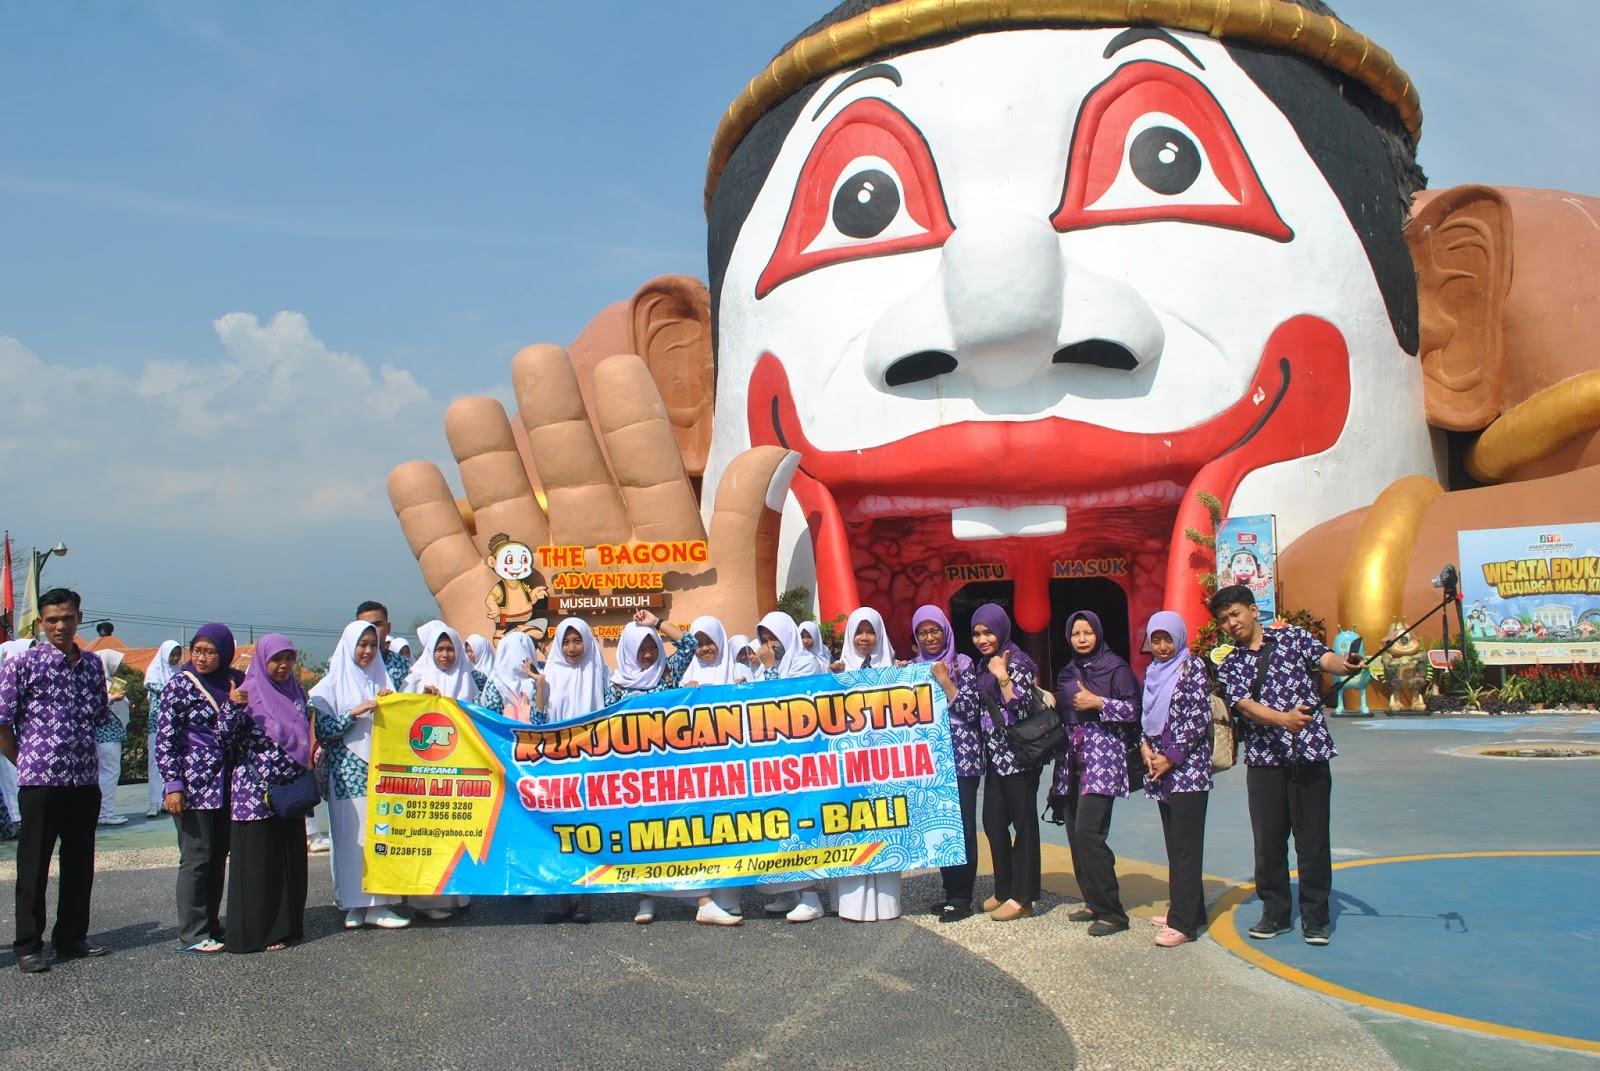 Kunjungan Museum Tubuh Smk Insan Mulia Yogyakarta Bagong Adventure Manusia